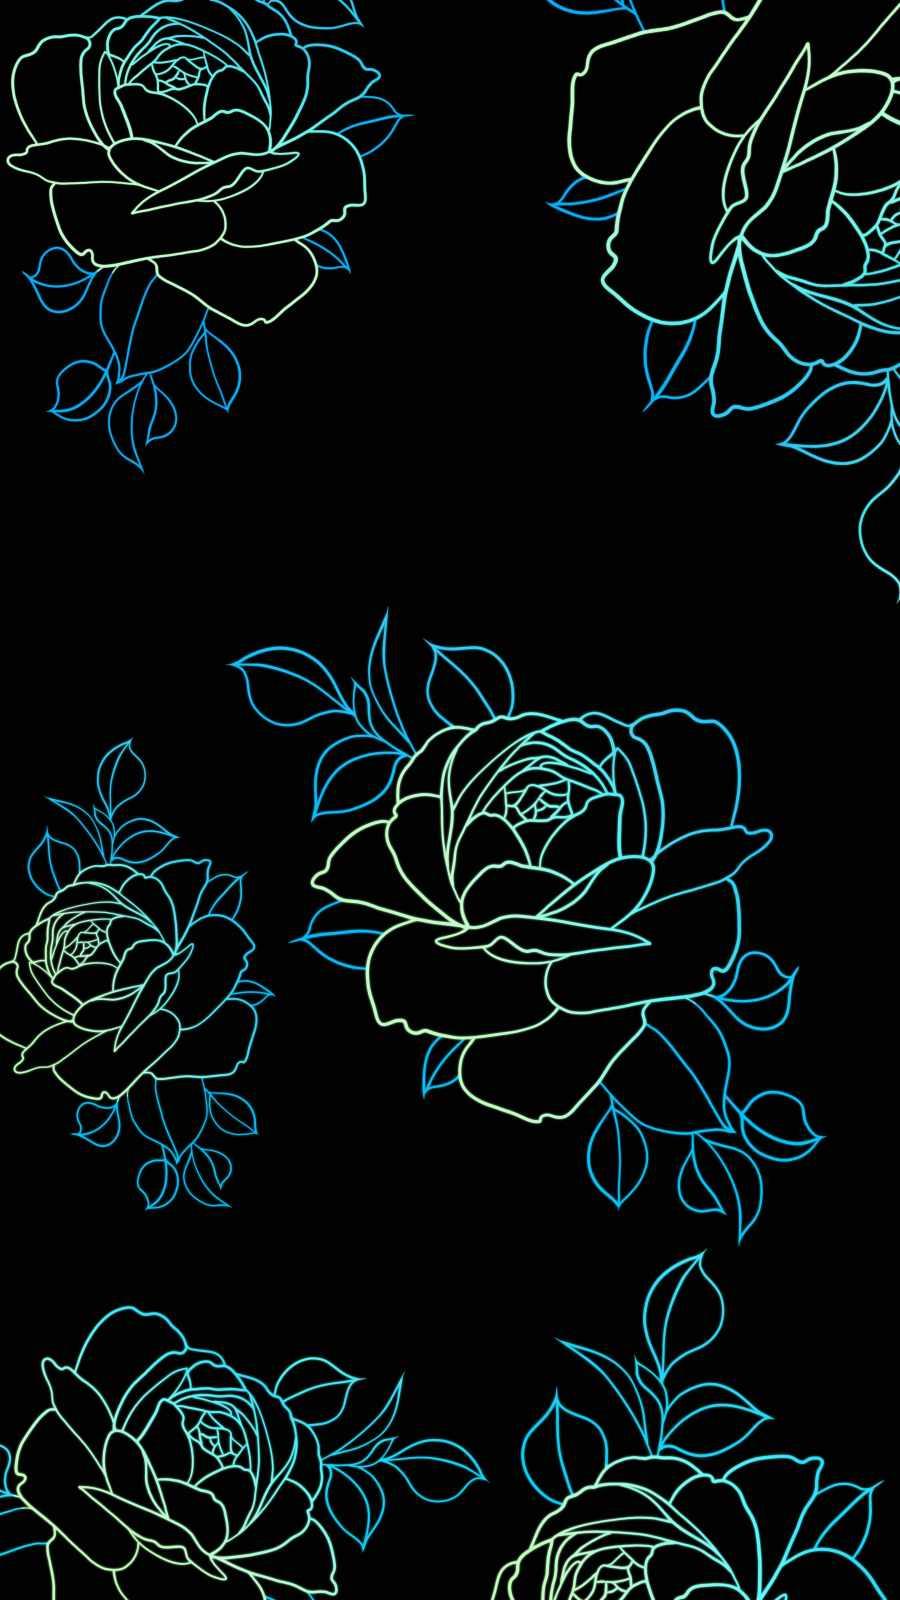 Amoled Flowers iPhone Wallpaper